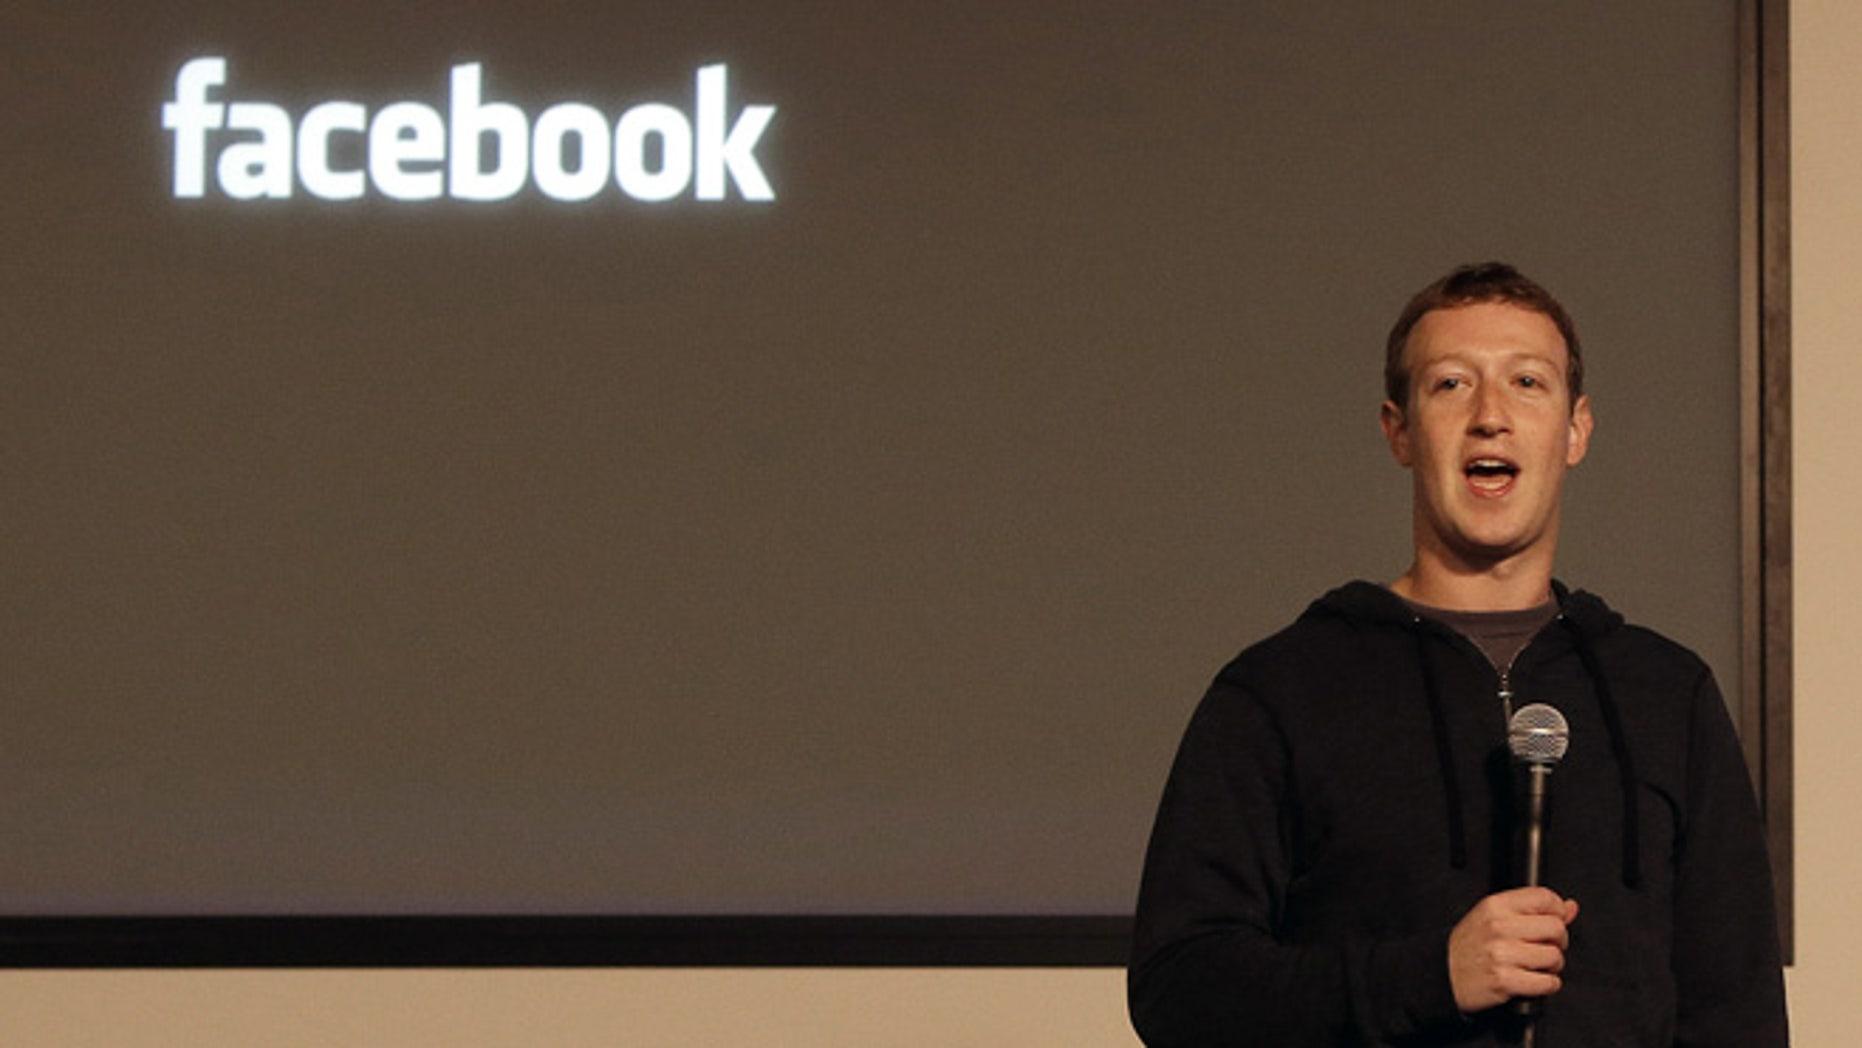 Jan. 15, 2013: Facebook CEO Mark Zuckerberg speaks at Facebook headquarters in Menlo Park, Calif.